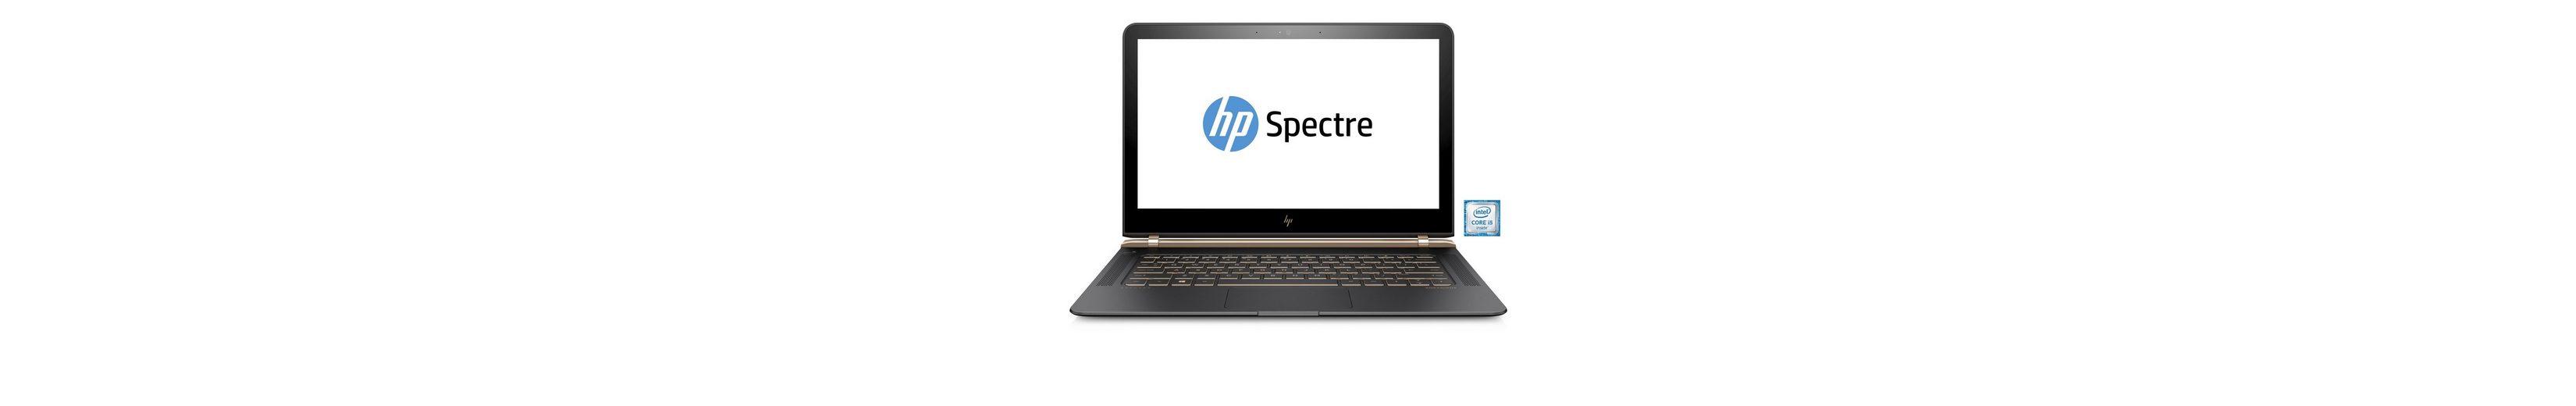 "HP Spectre 13-v001ng Notebook »Intel Core i5, 33,8cm (13,3""), 256 GB SSD, 8GB«"